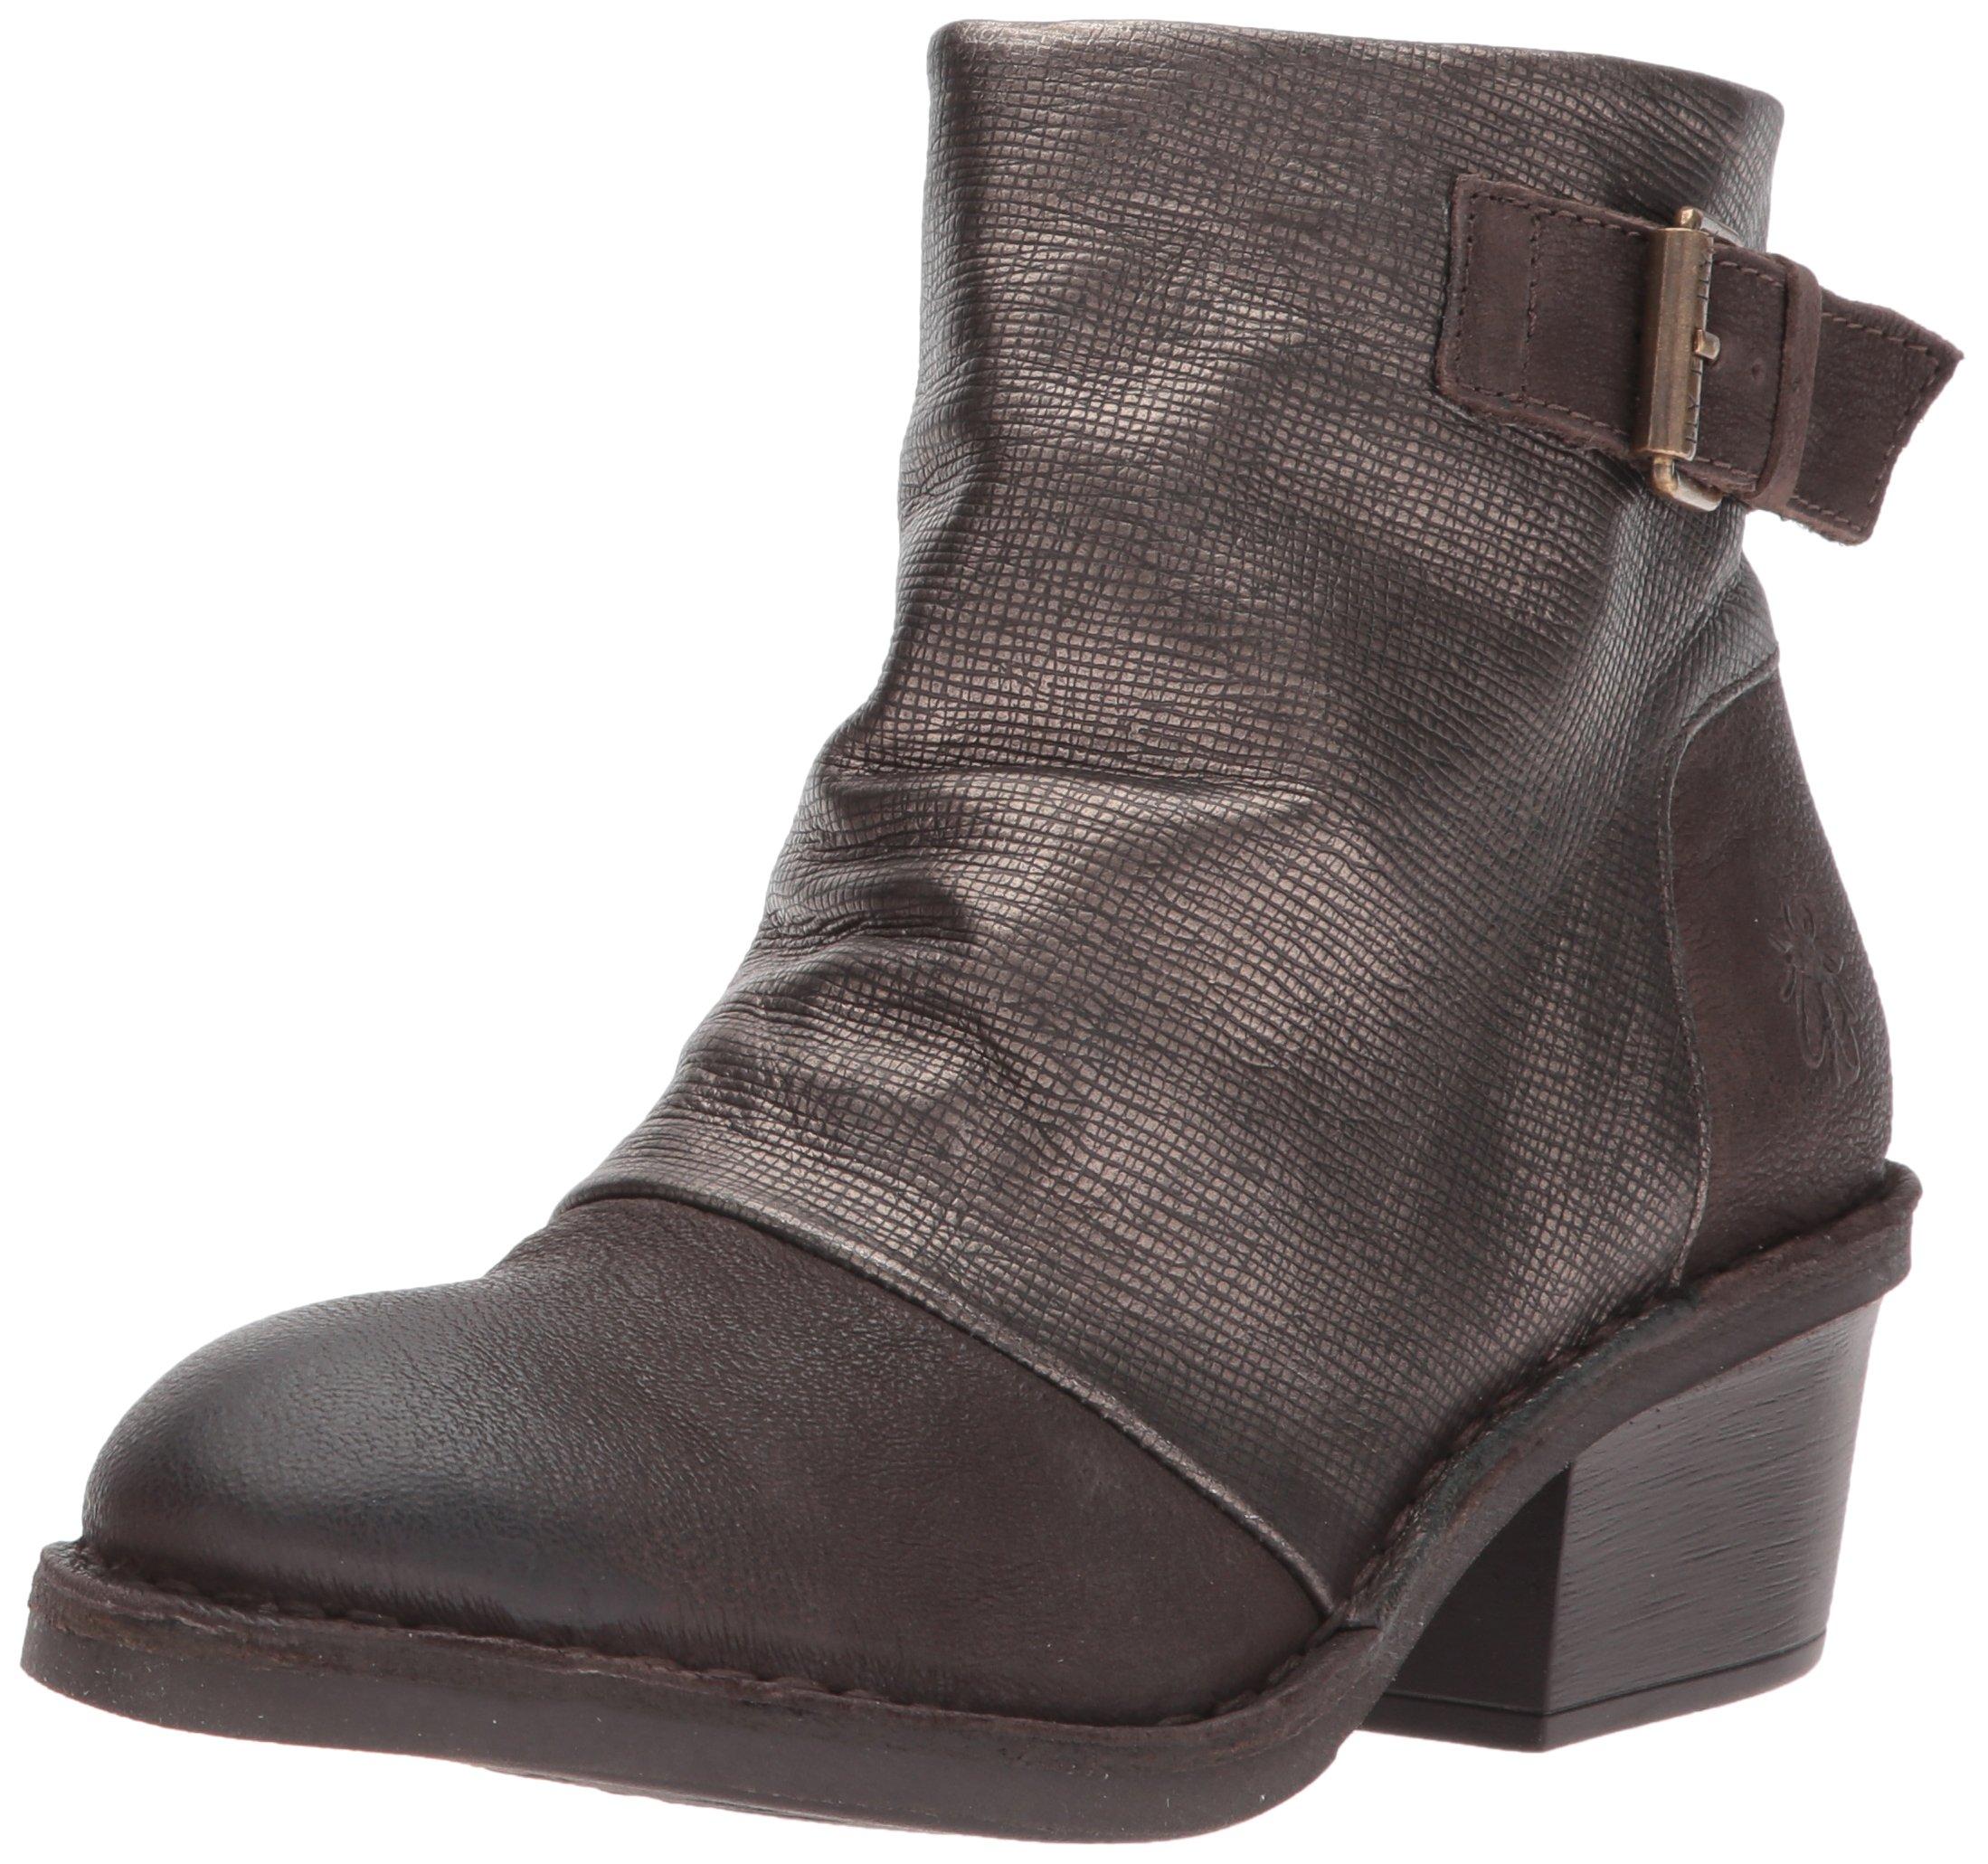 FLY London Damen Adit951fly Desert Boots, Braun (Sludge), 35 EU